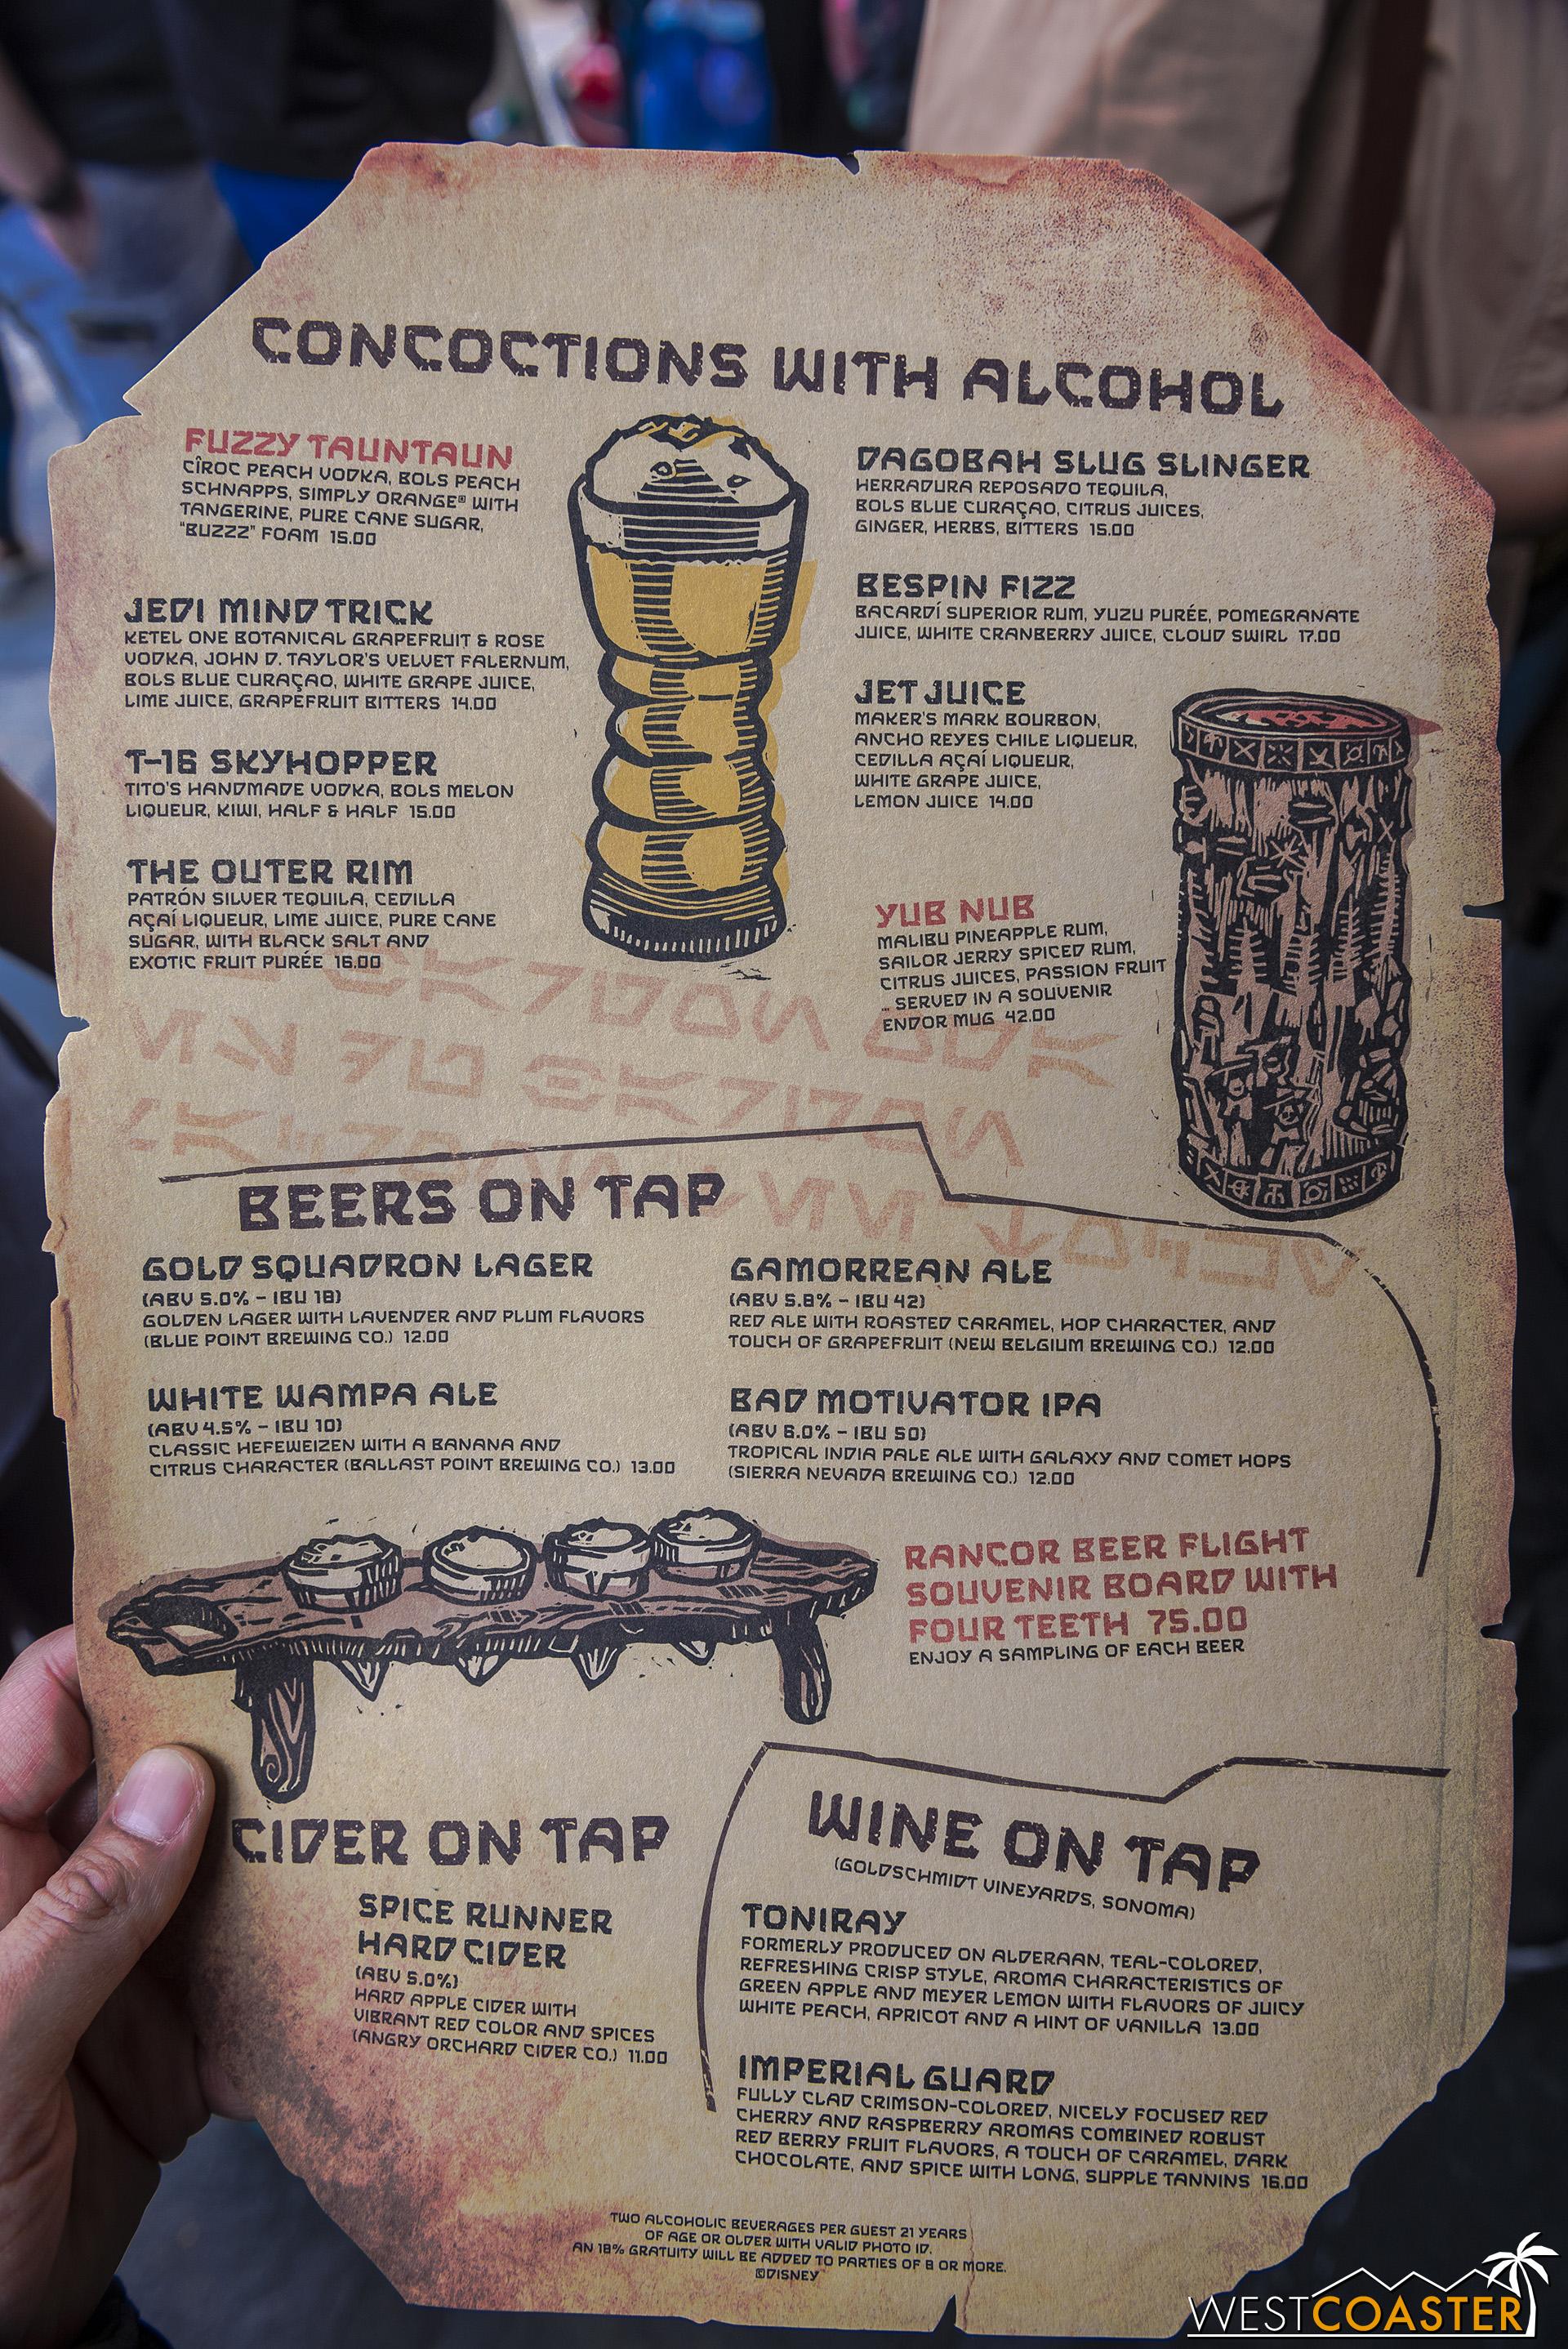 Front of the regular menu.